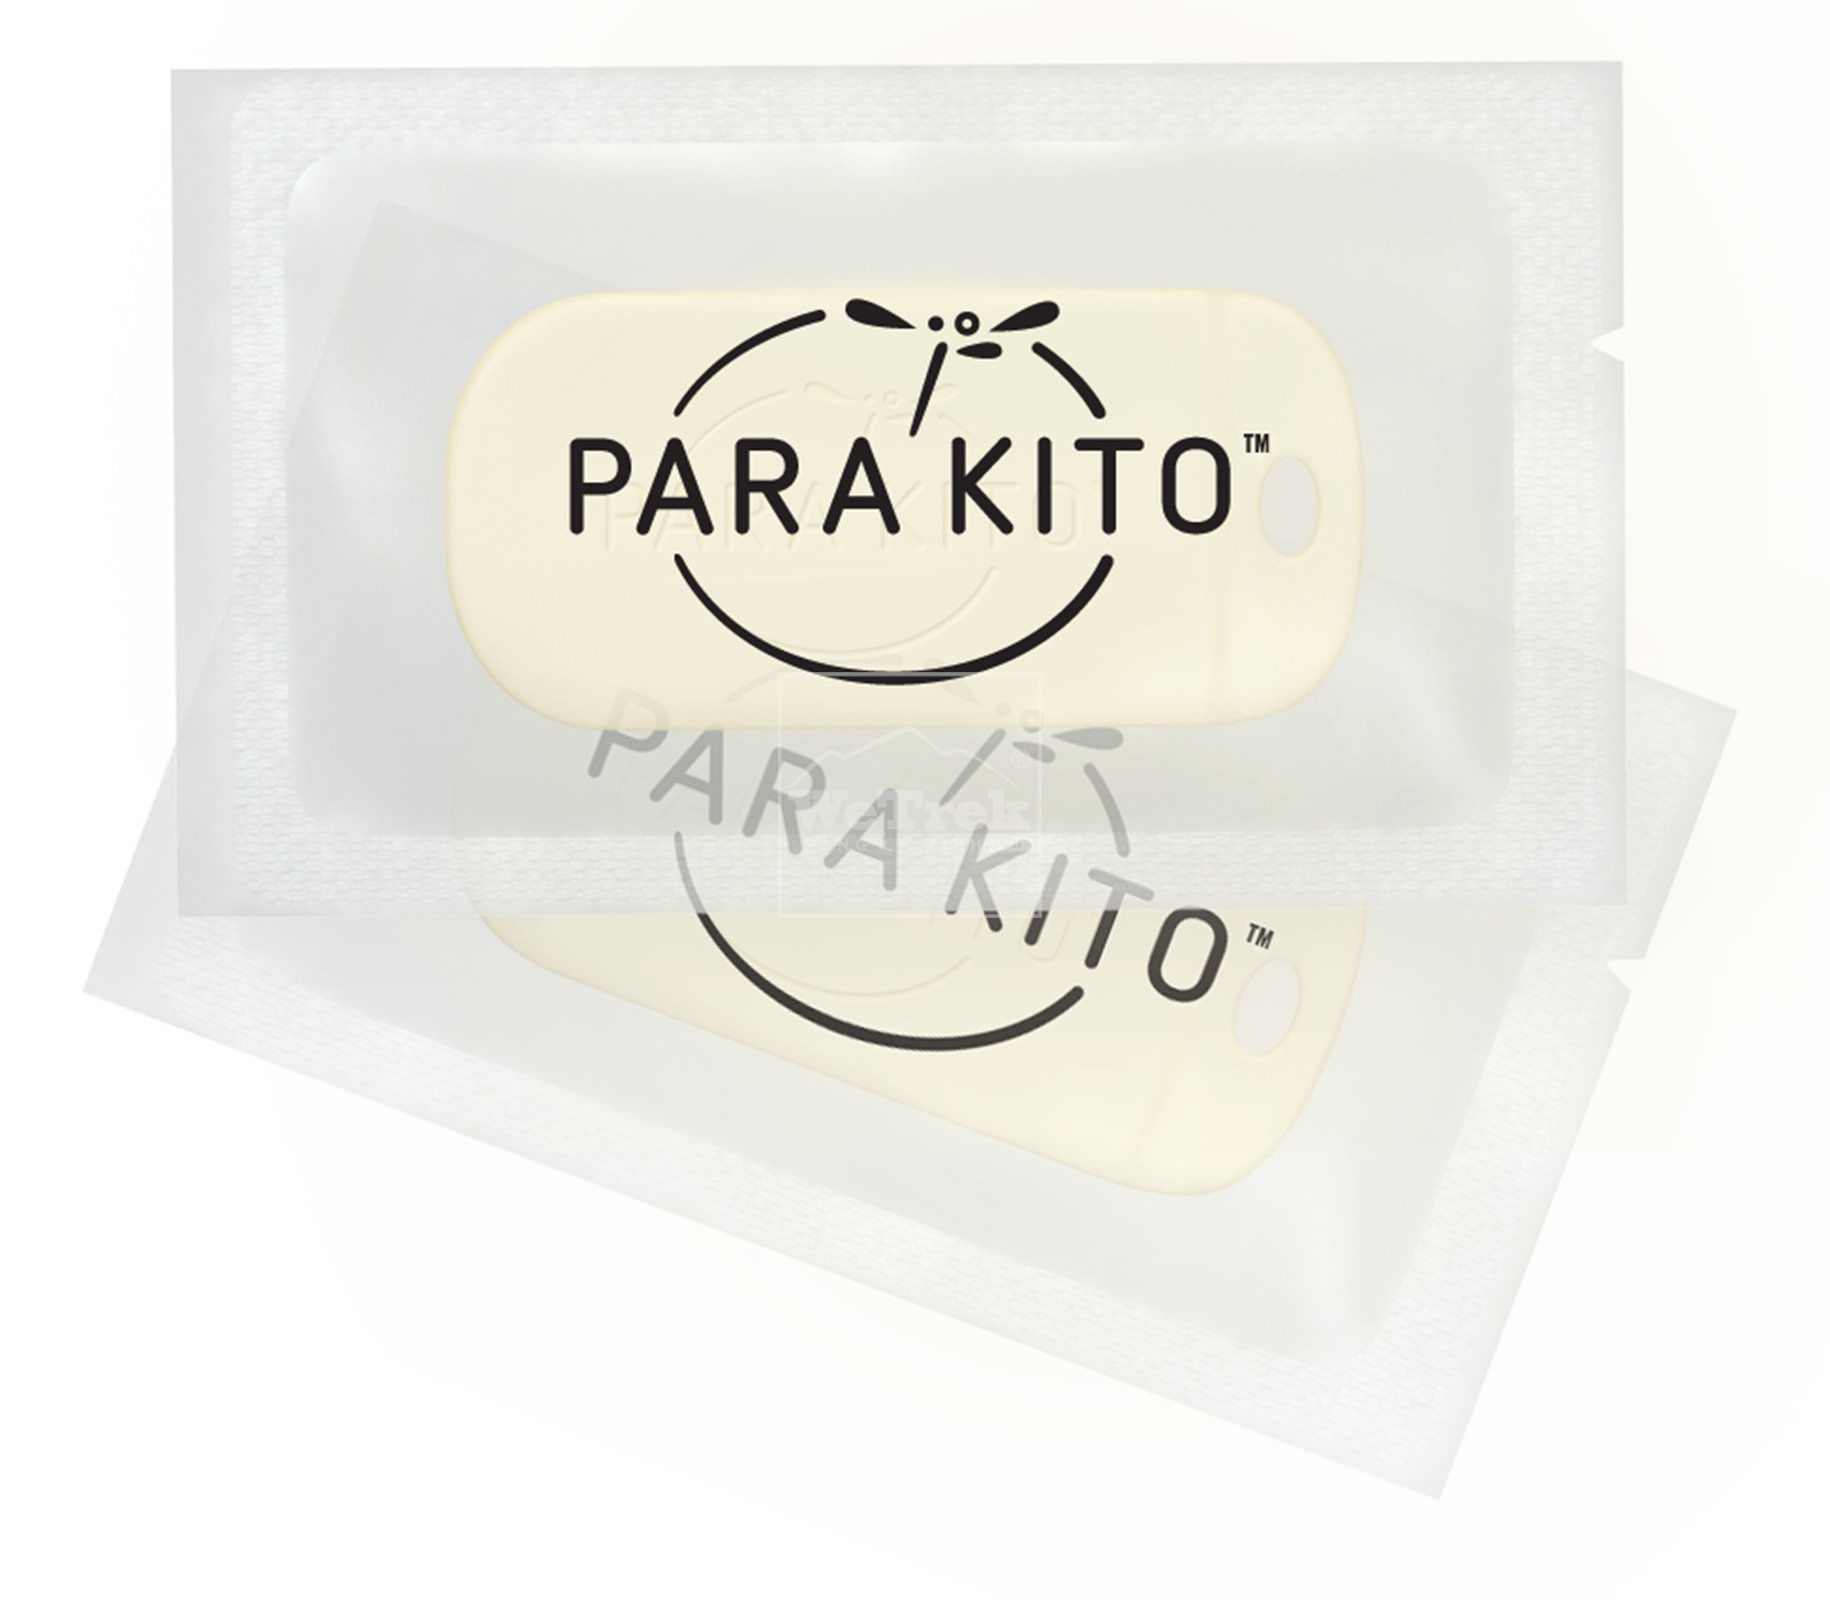 vien-chong-muoi-kem-moc-cai-parakito-grey-clip-7651-wetrek.vn-2